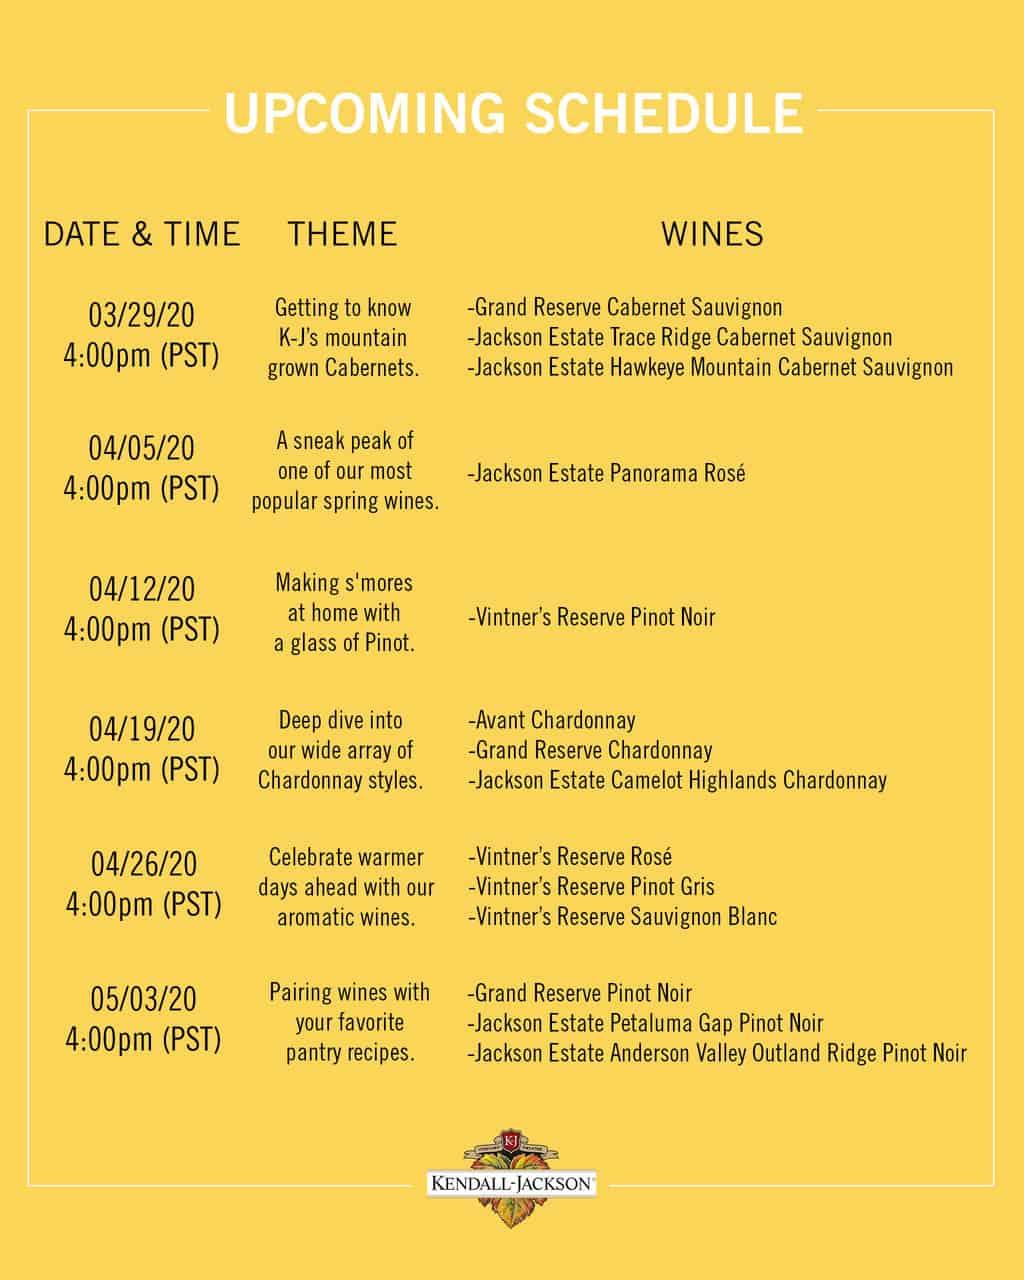 Kendall Jackson wine tasting schedule